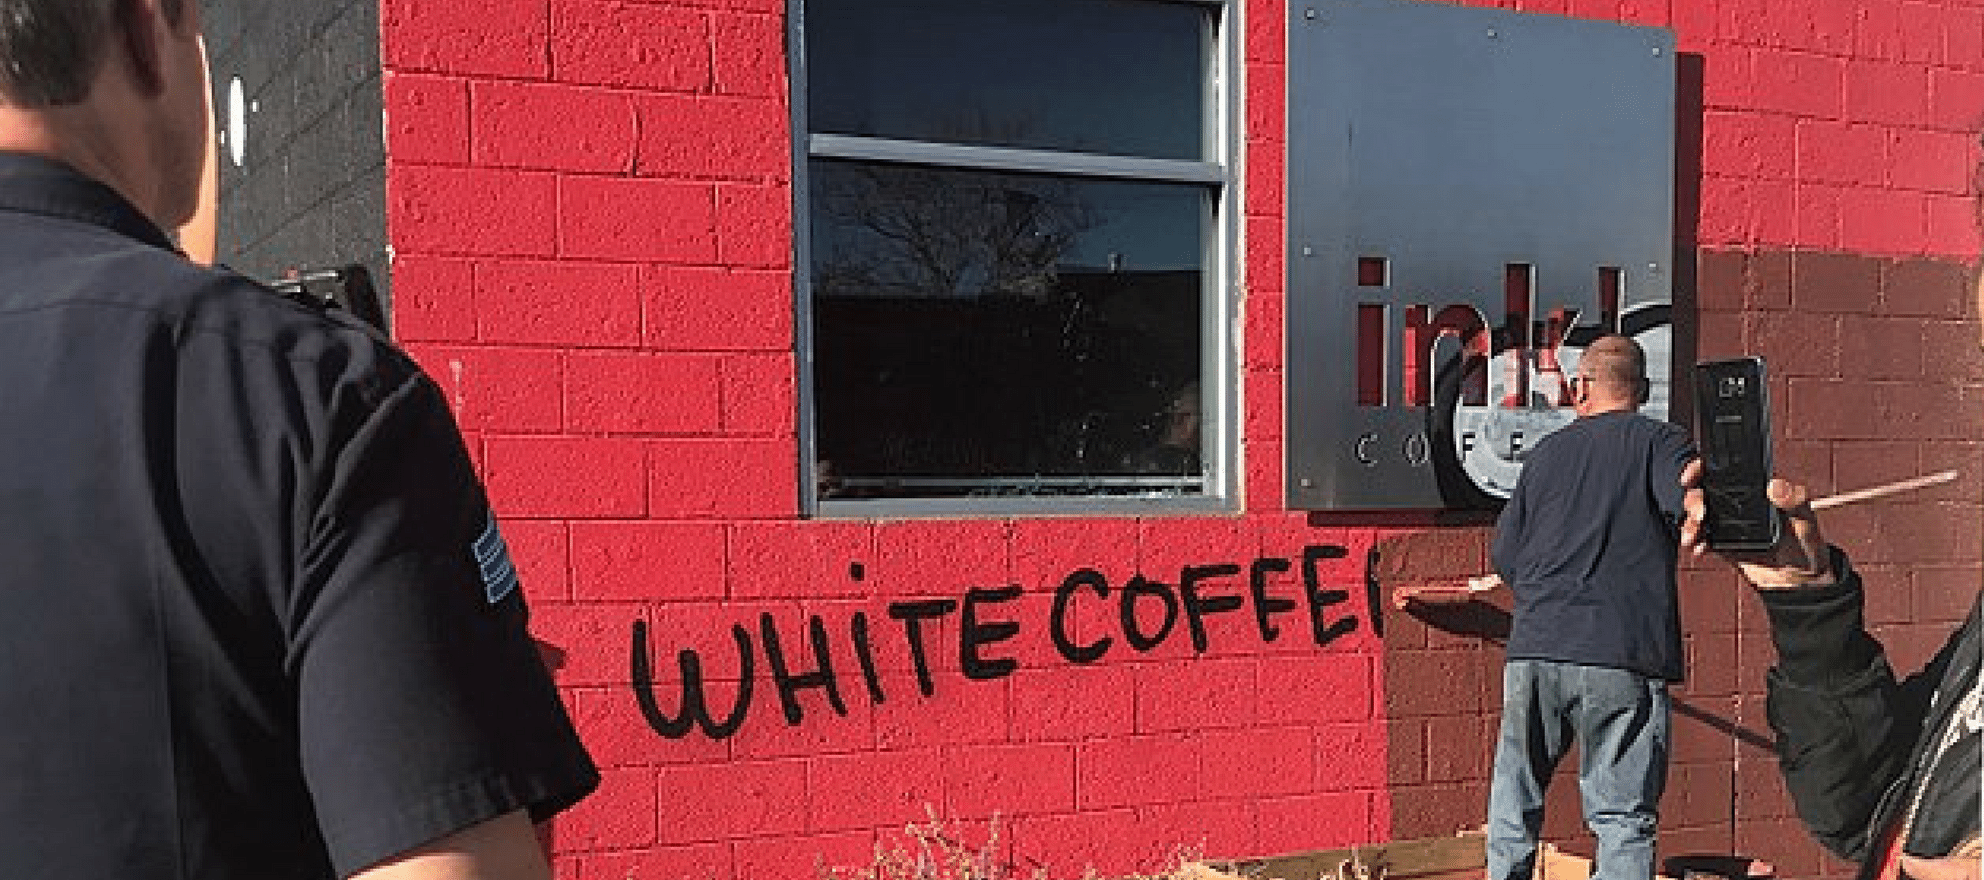 Coffee shop jokes about gentrification, ignites backlash